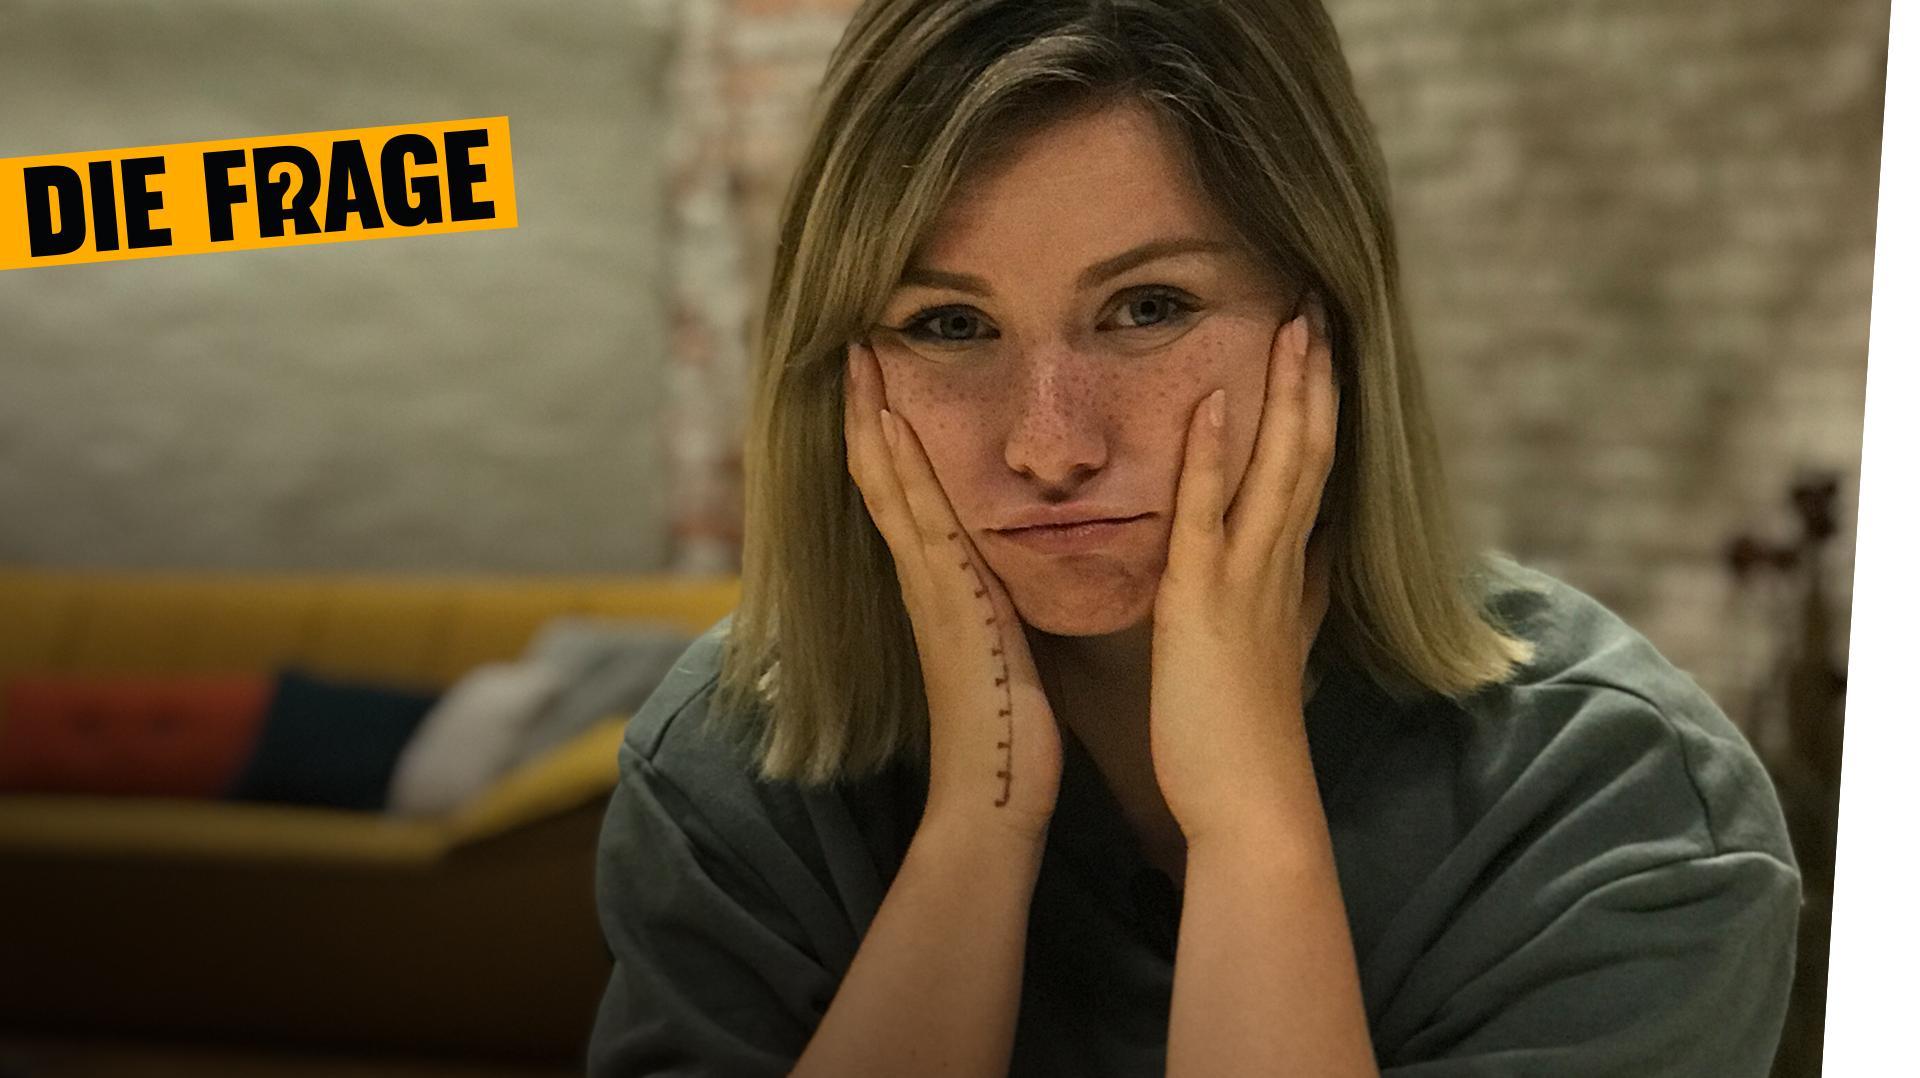 Porno misses vlog Kelly MissesVlog